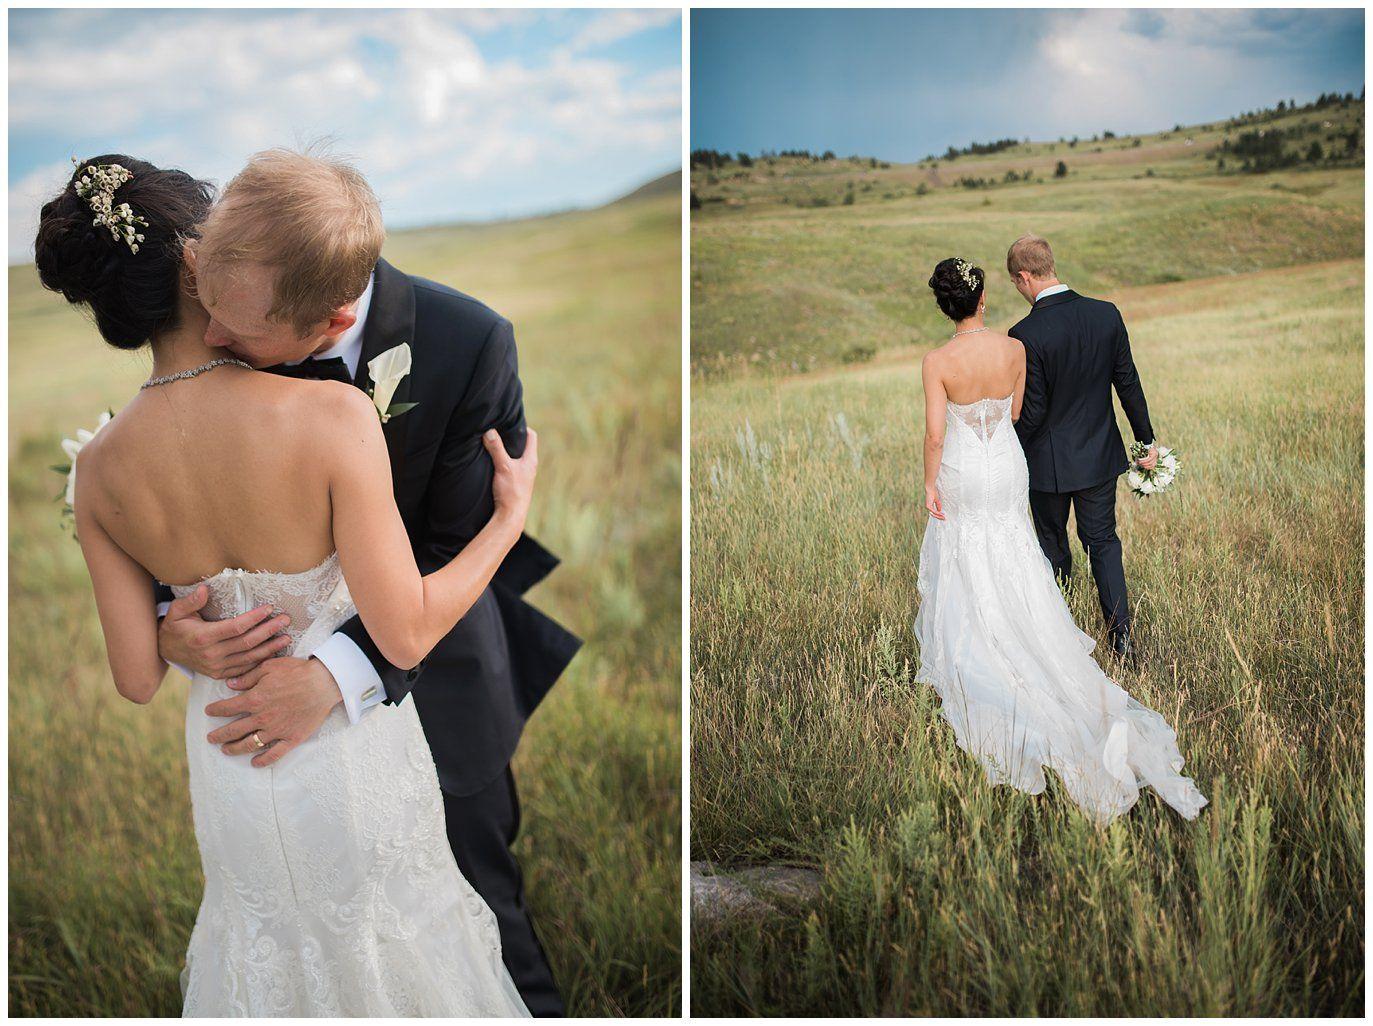 Bride in lace dress in colorado summer fields photo wedding